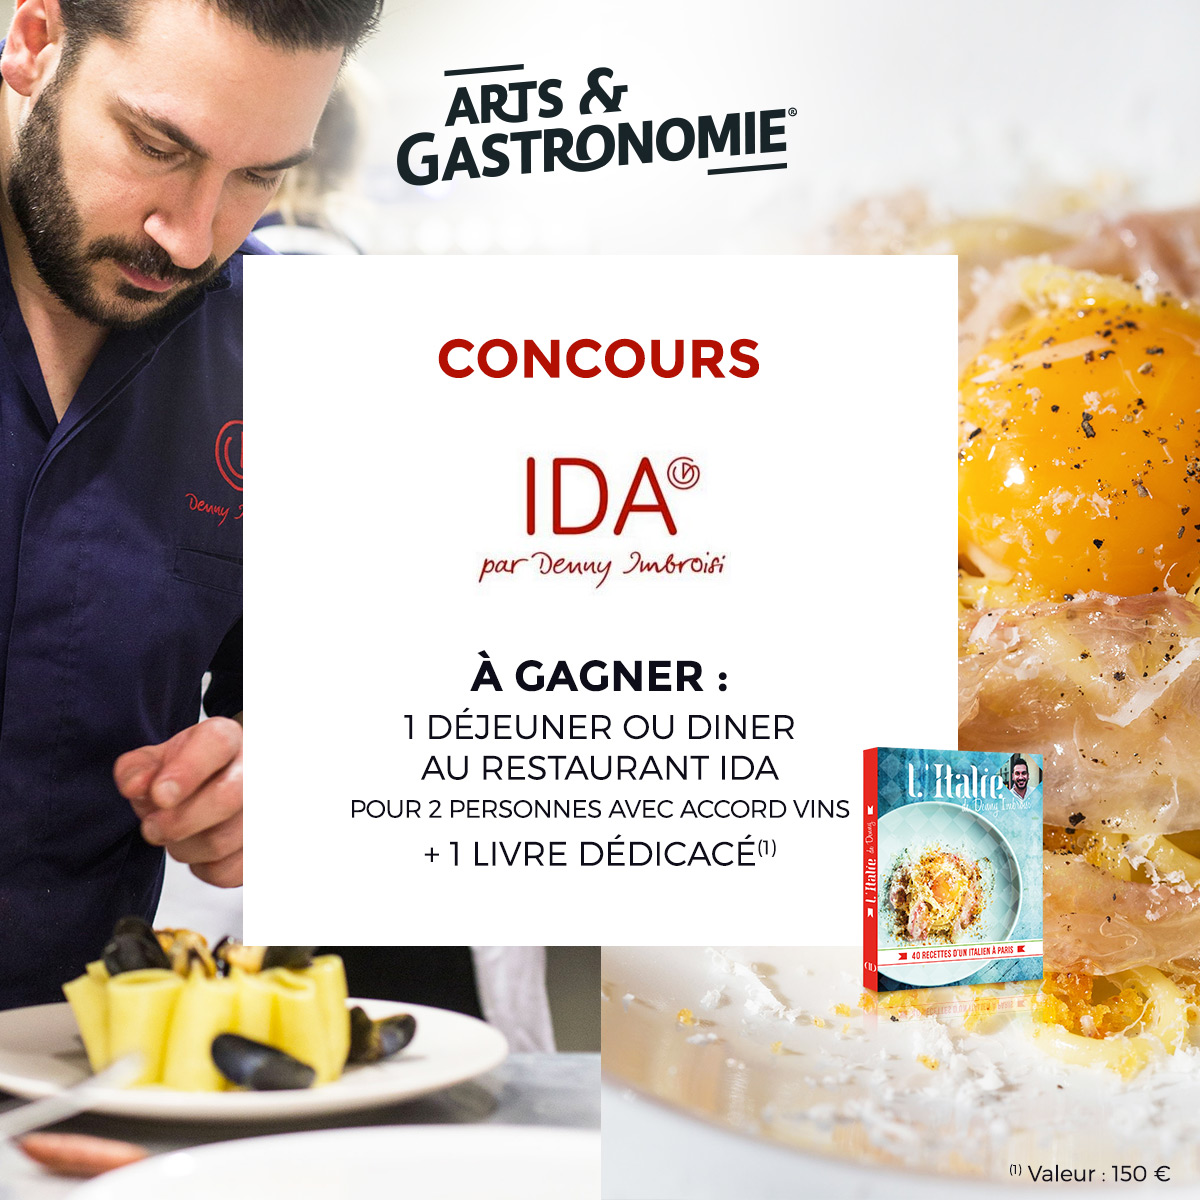 Denny Imbroisi restaurant IDA concours